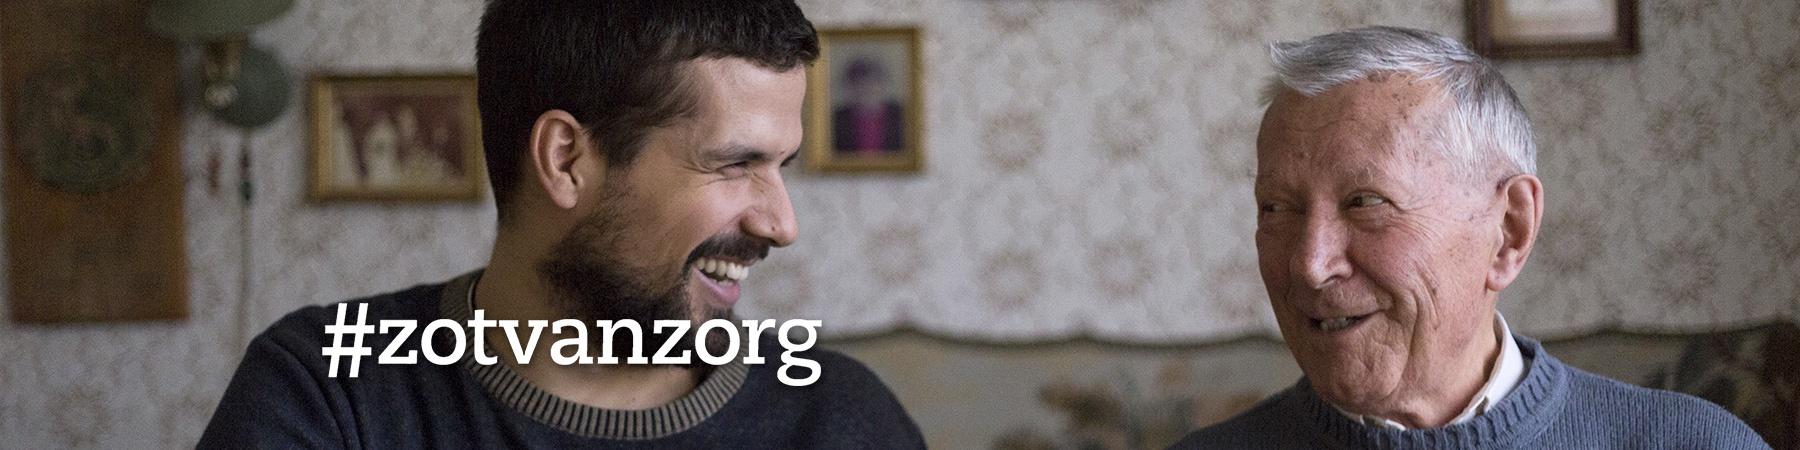 zotvanzorg_website_4_5.jpg